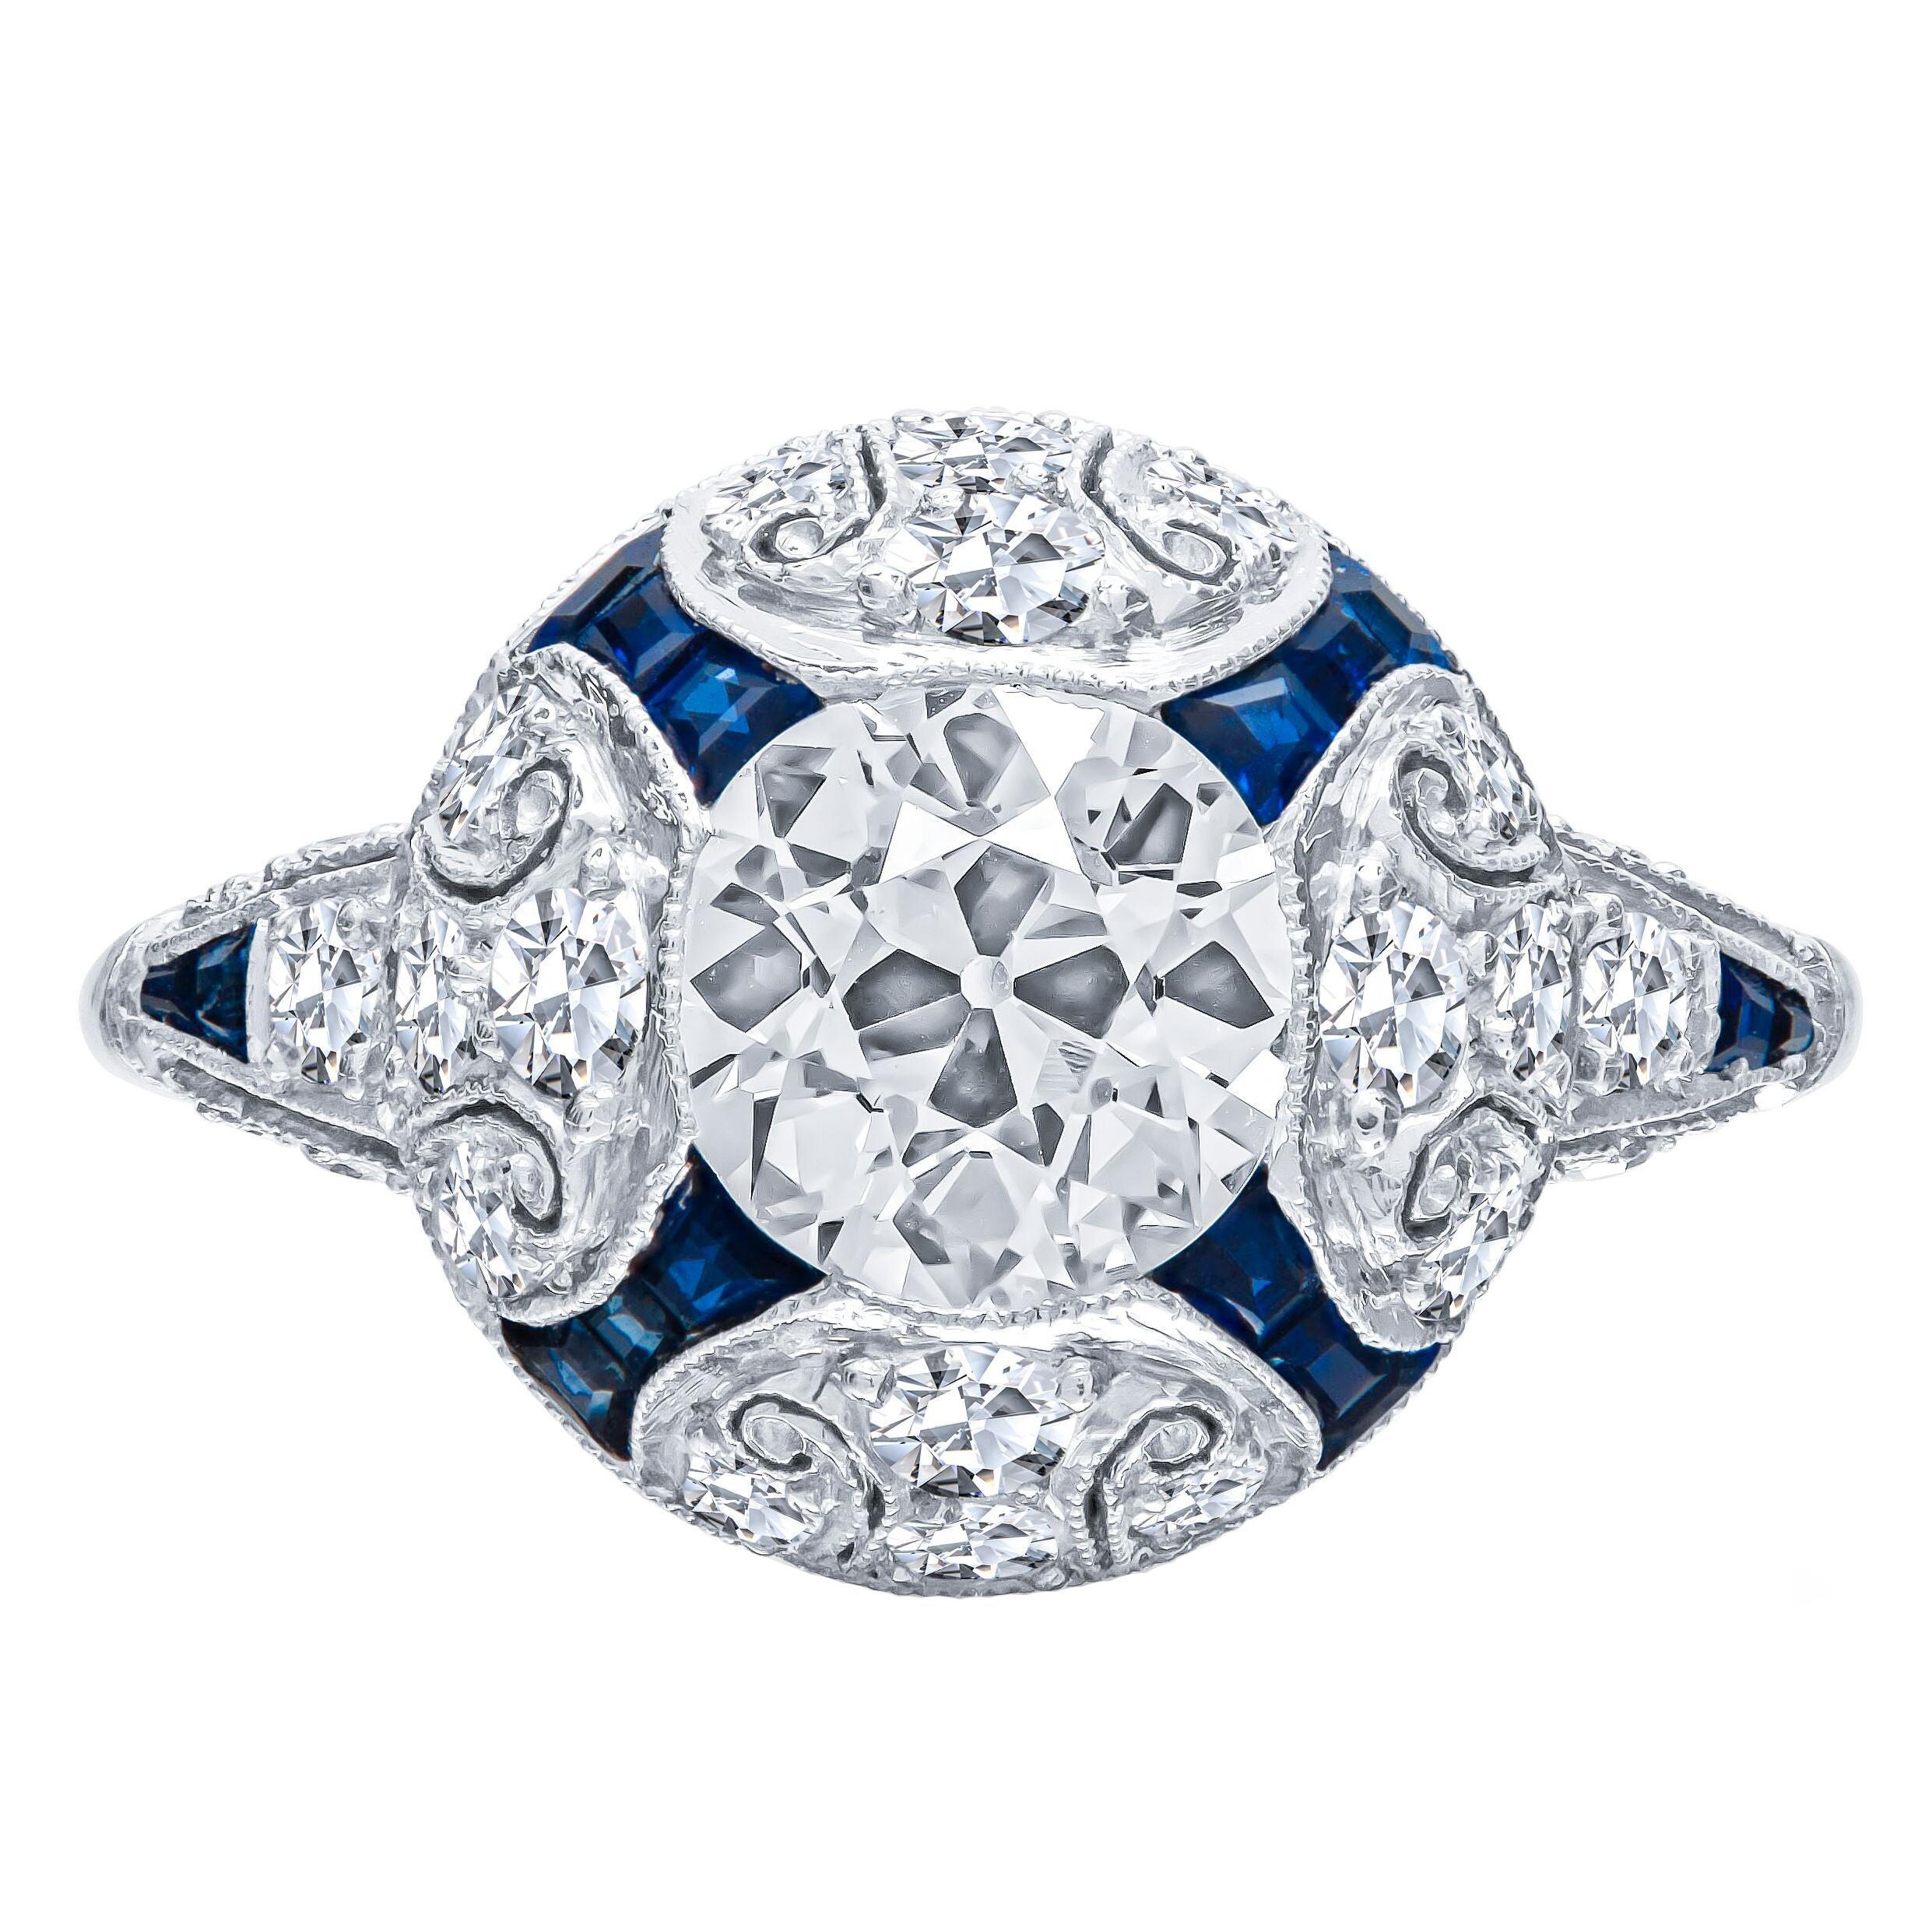 Art Deco Style 2.47 Carat Old European Cut Diamond Platinum Engagement Ring